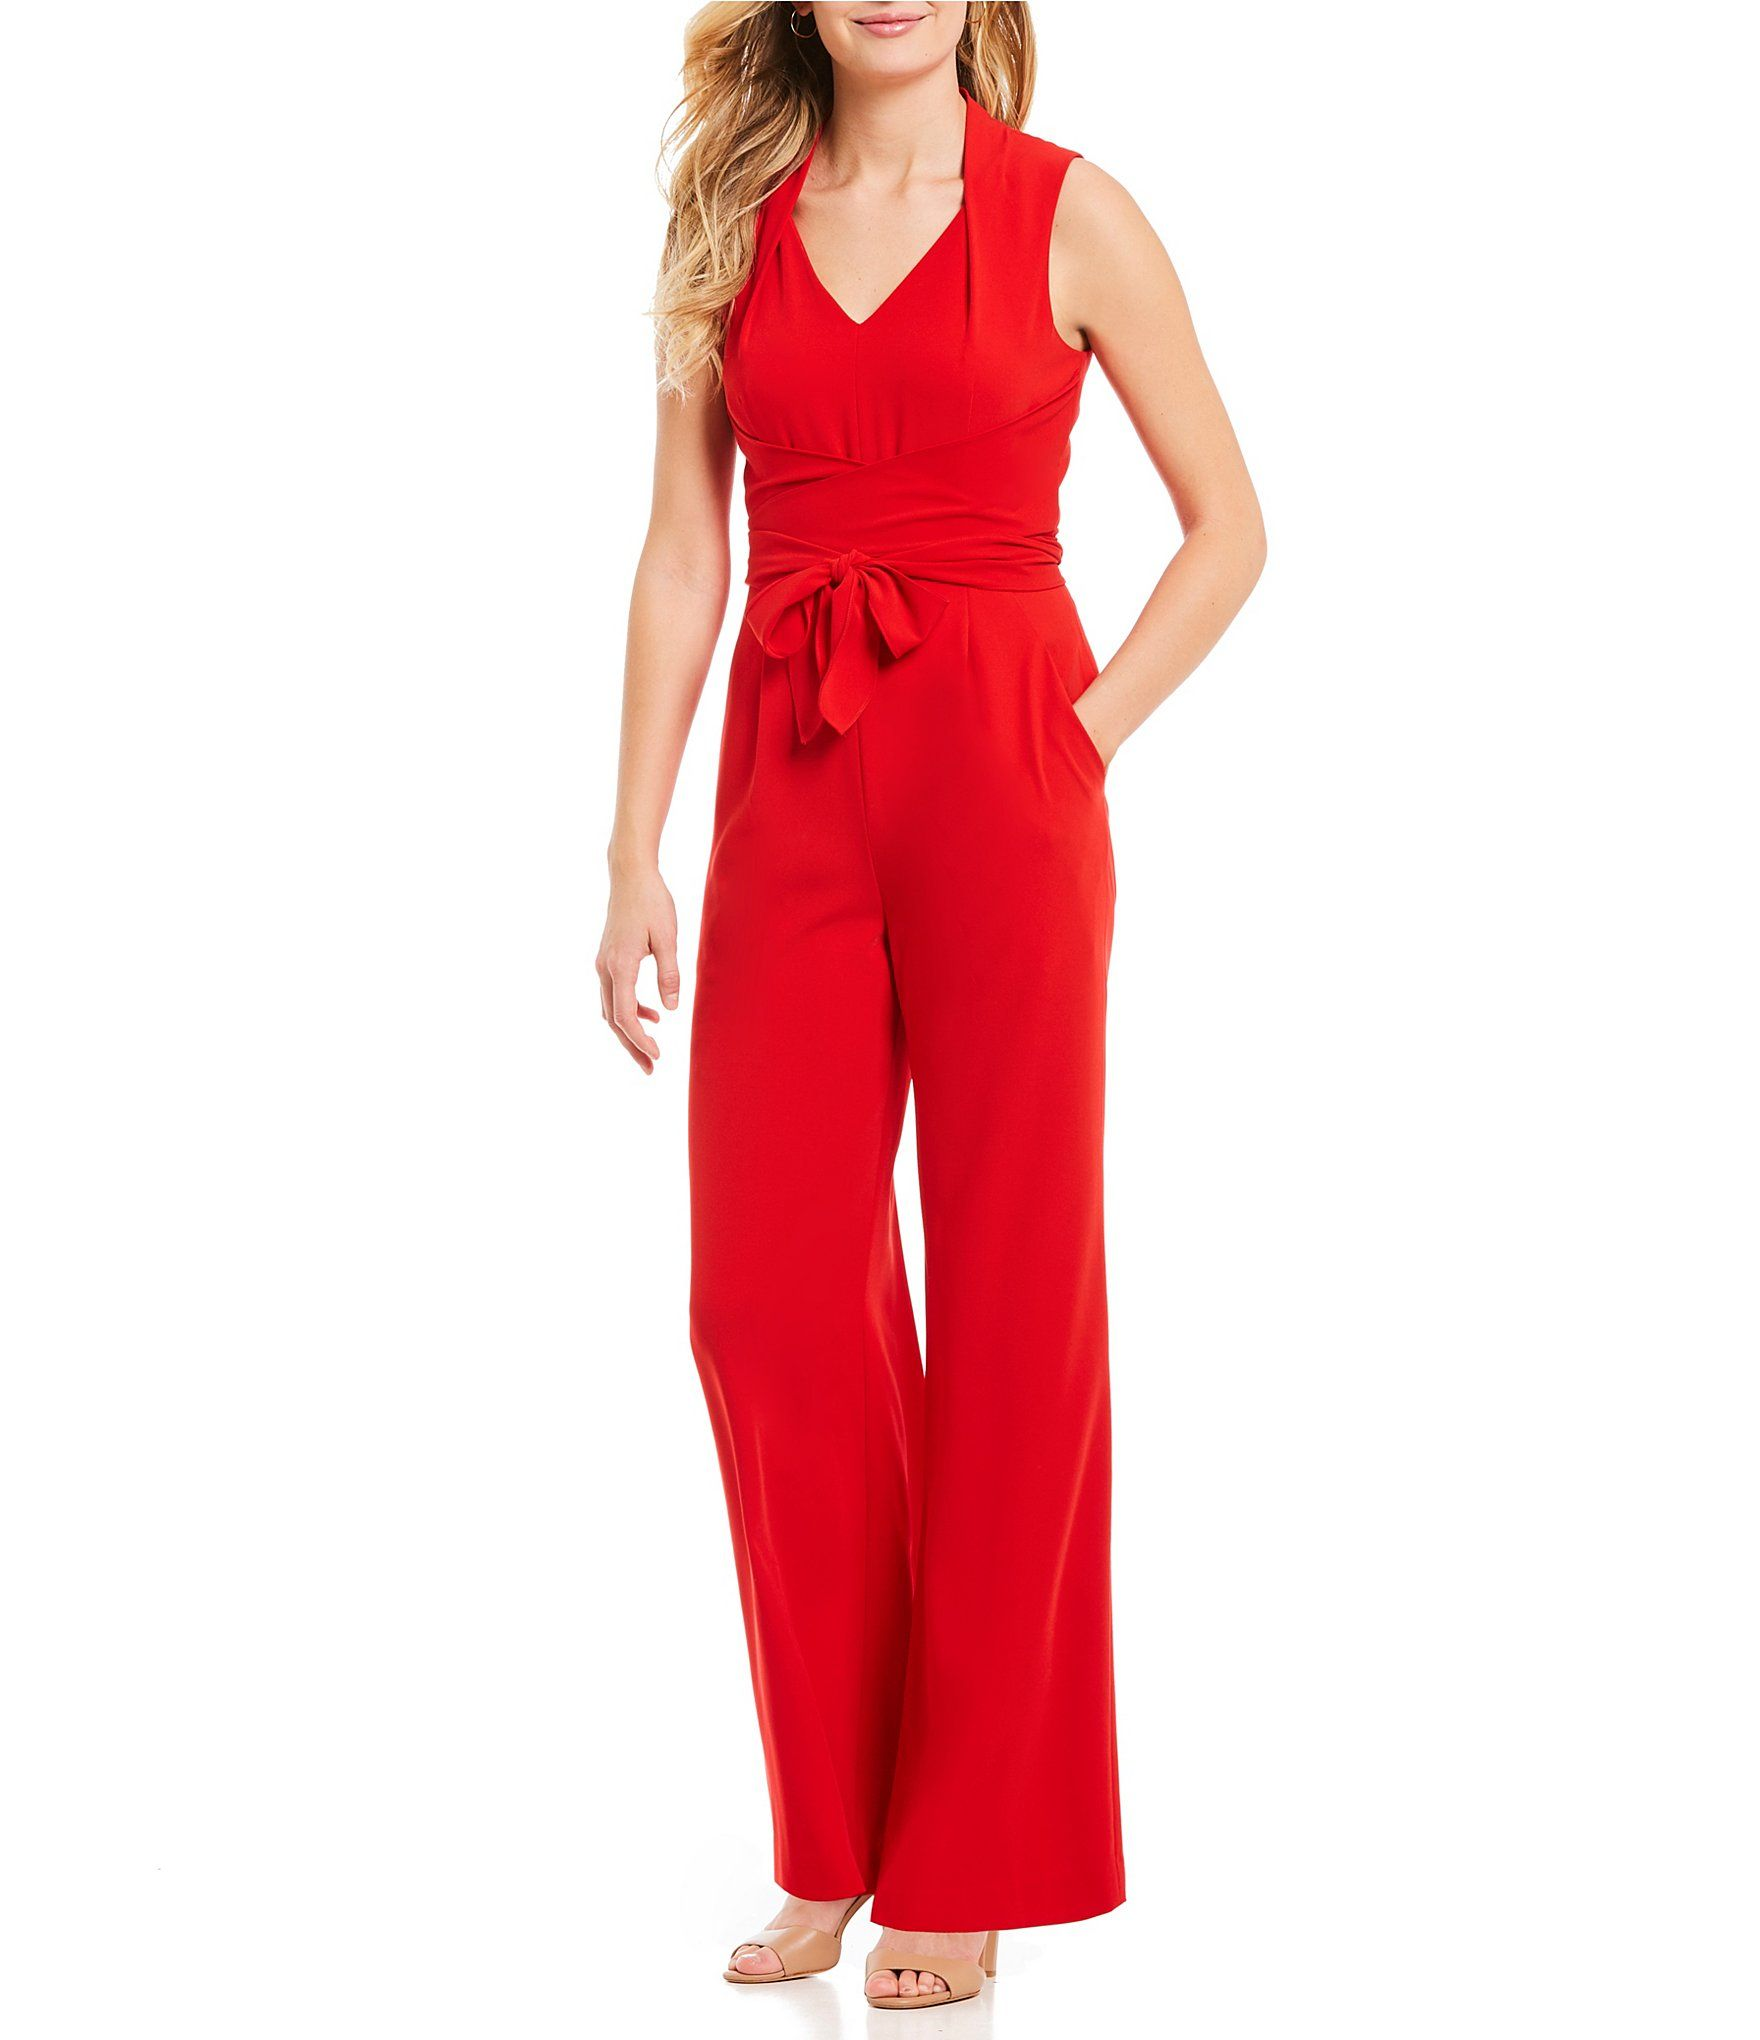 845216f685 I would love this in black or blue! Antonio Melani Jason VNeck Sleeveless  Crepe Jumpsuit  Dillards